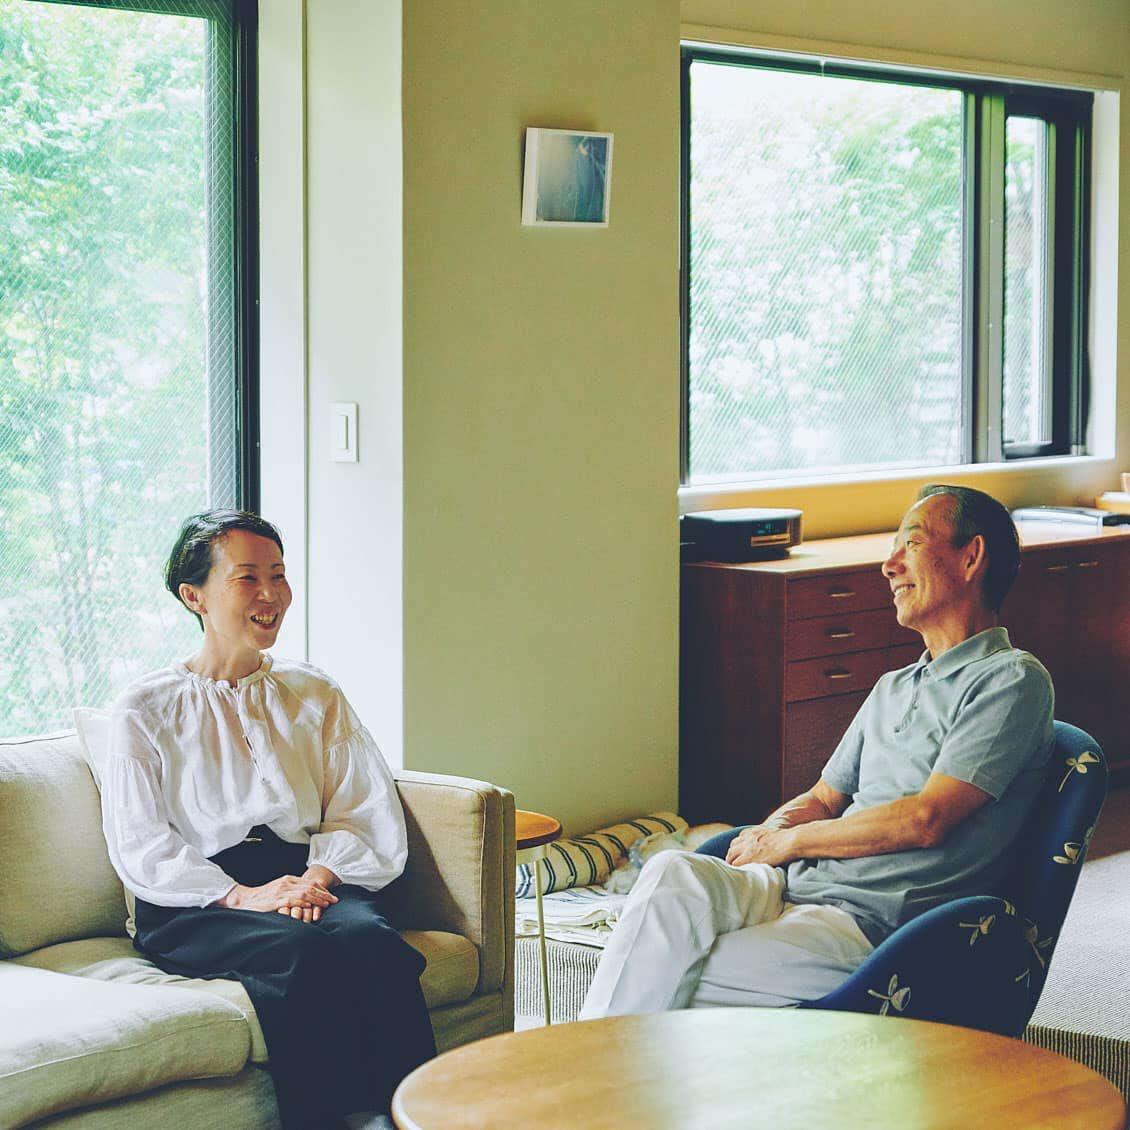 【BRAND NOTE】第2話:二世帯暮らしで気づいた、グリーンの楽しみ。(引田かおりさん・ターセンさん)